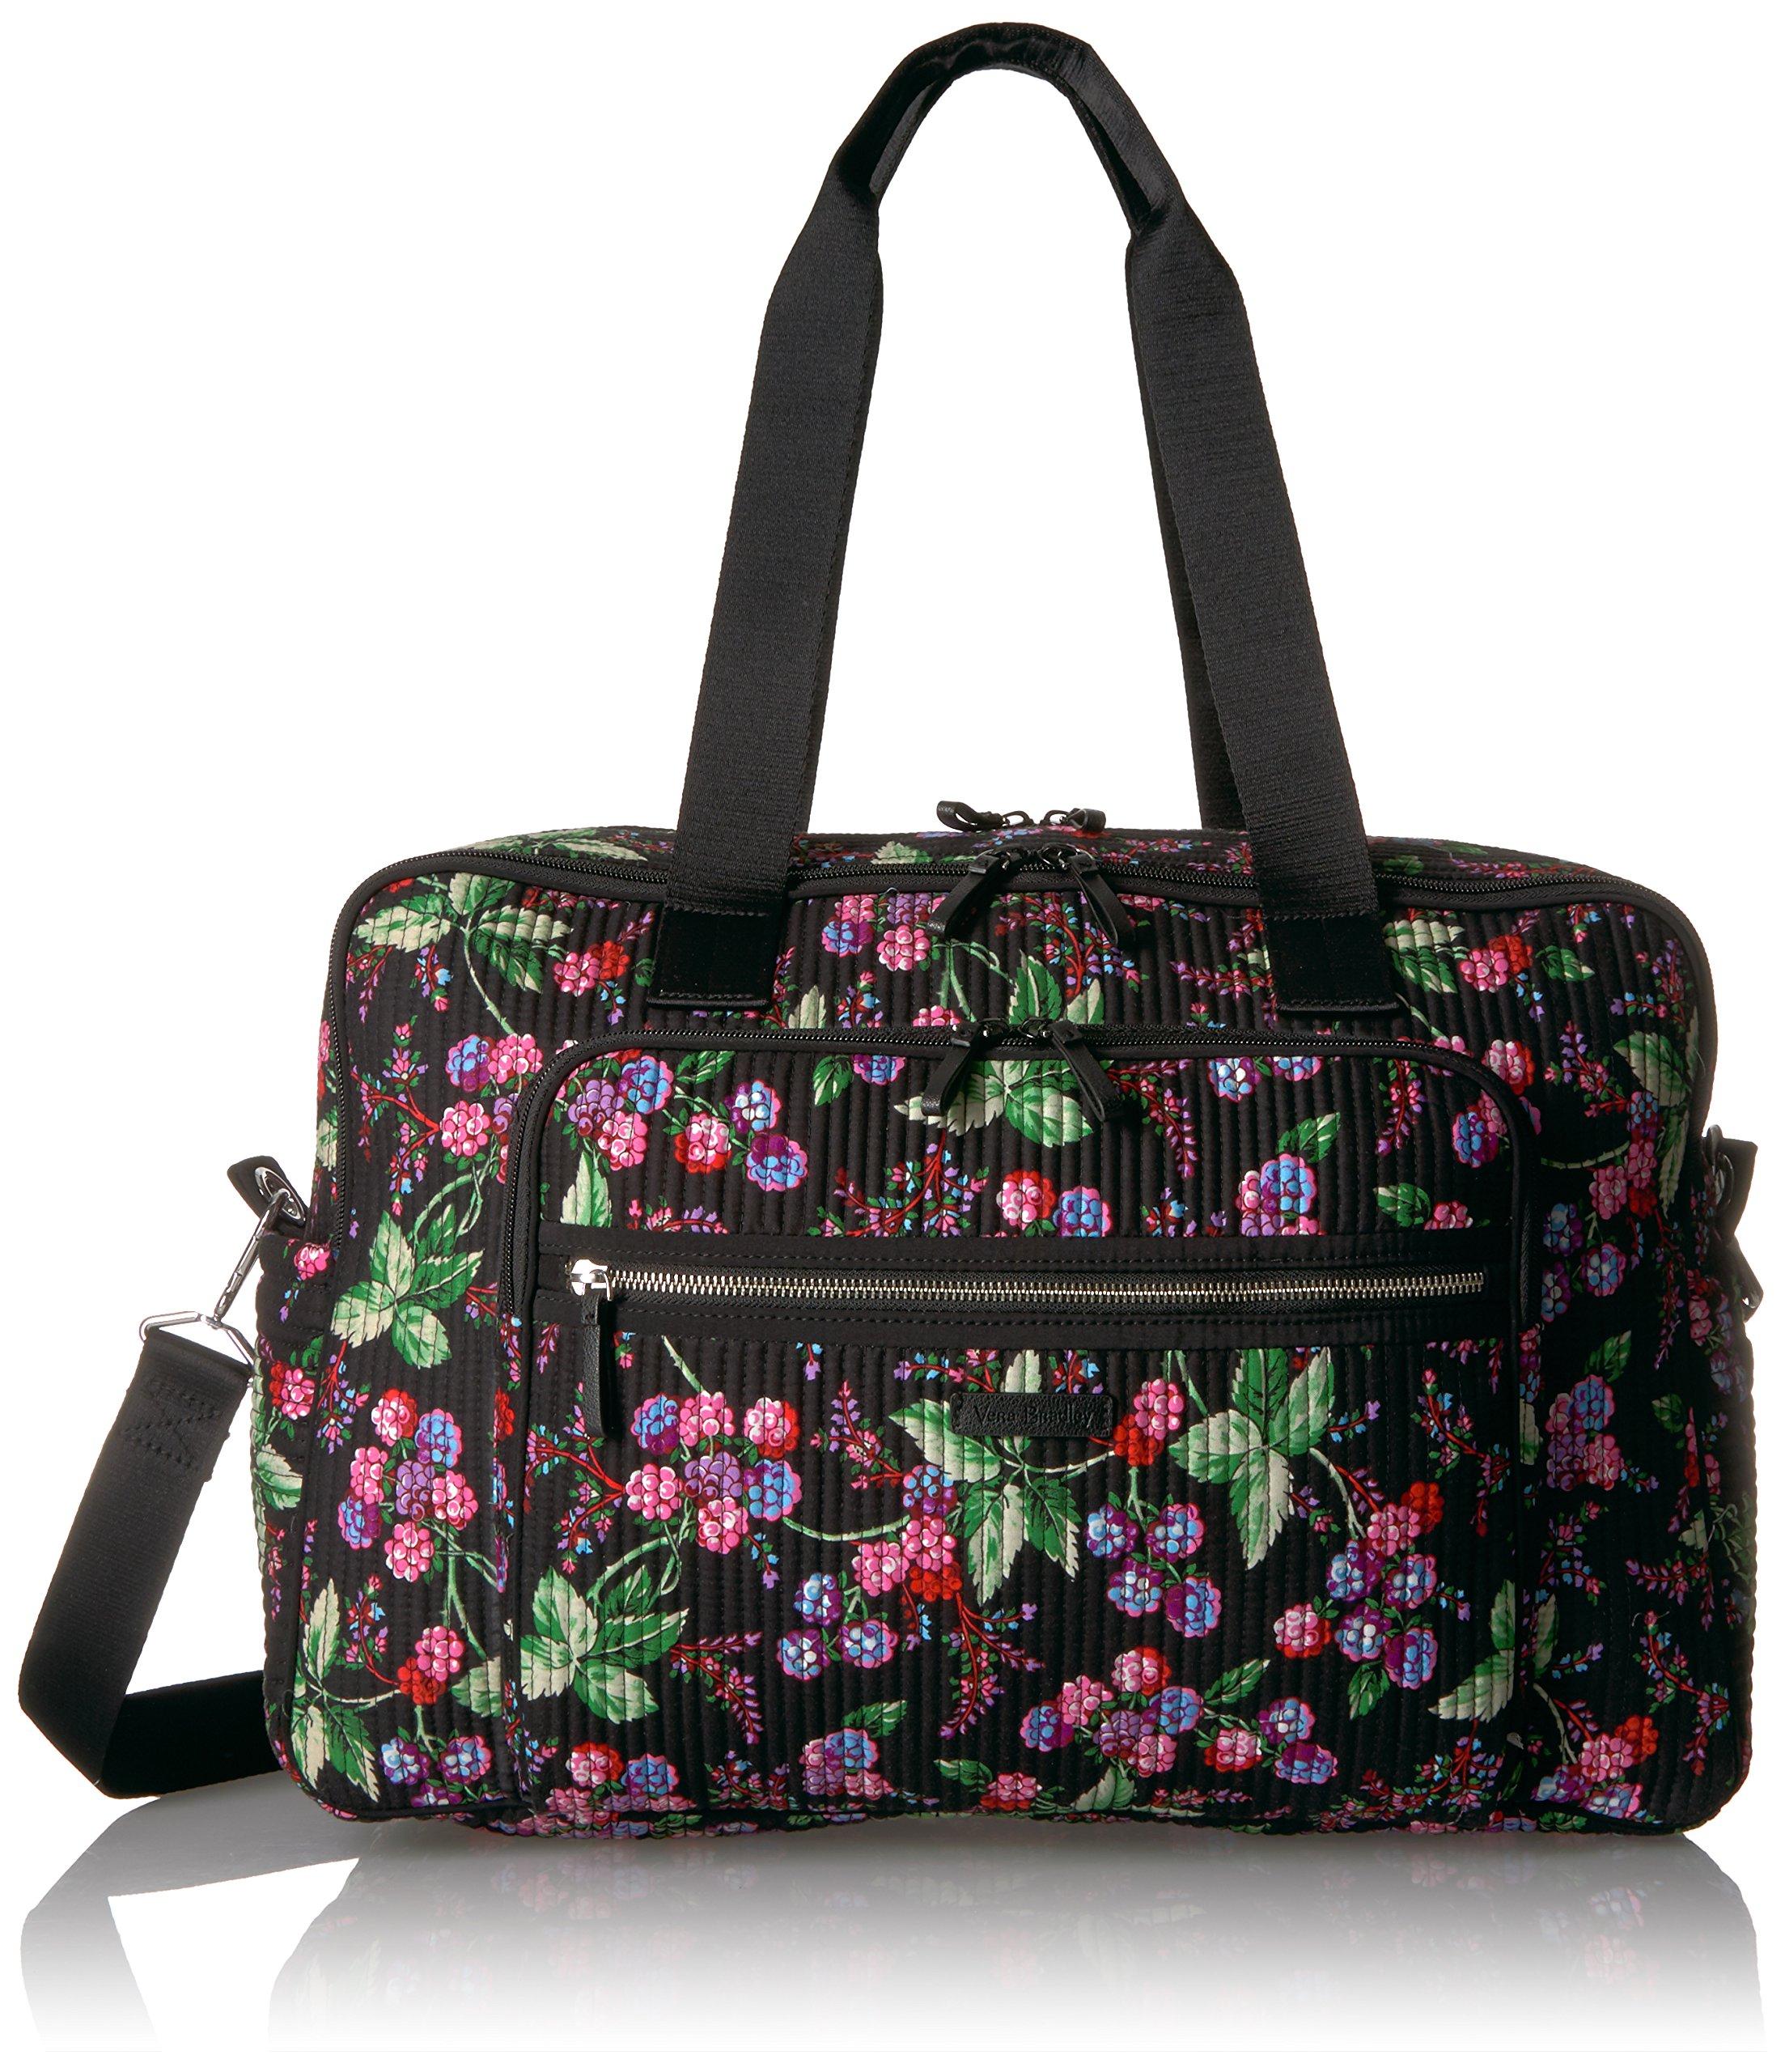 Vera Bradley Women's Iconic Deluxe Weekender Travel Bag-Signature